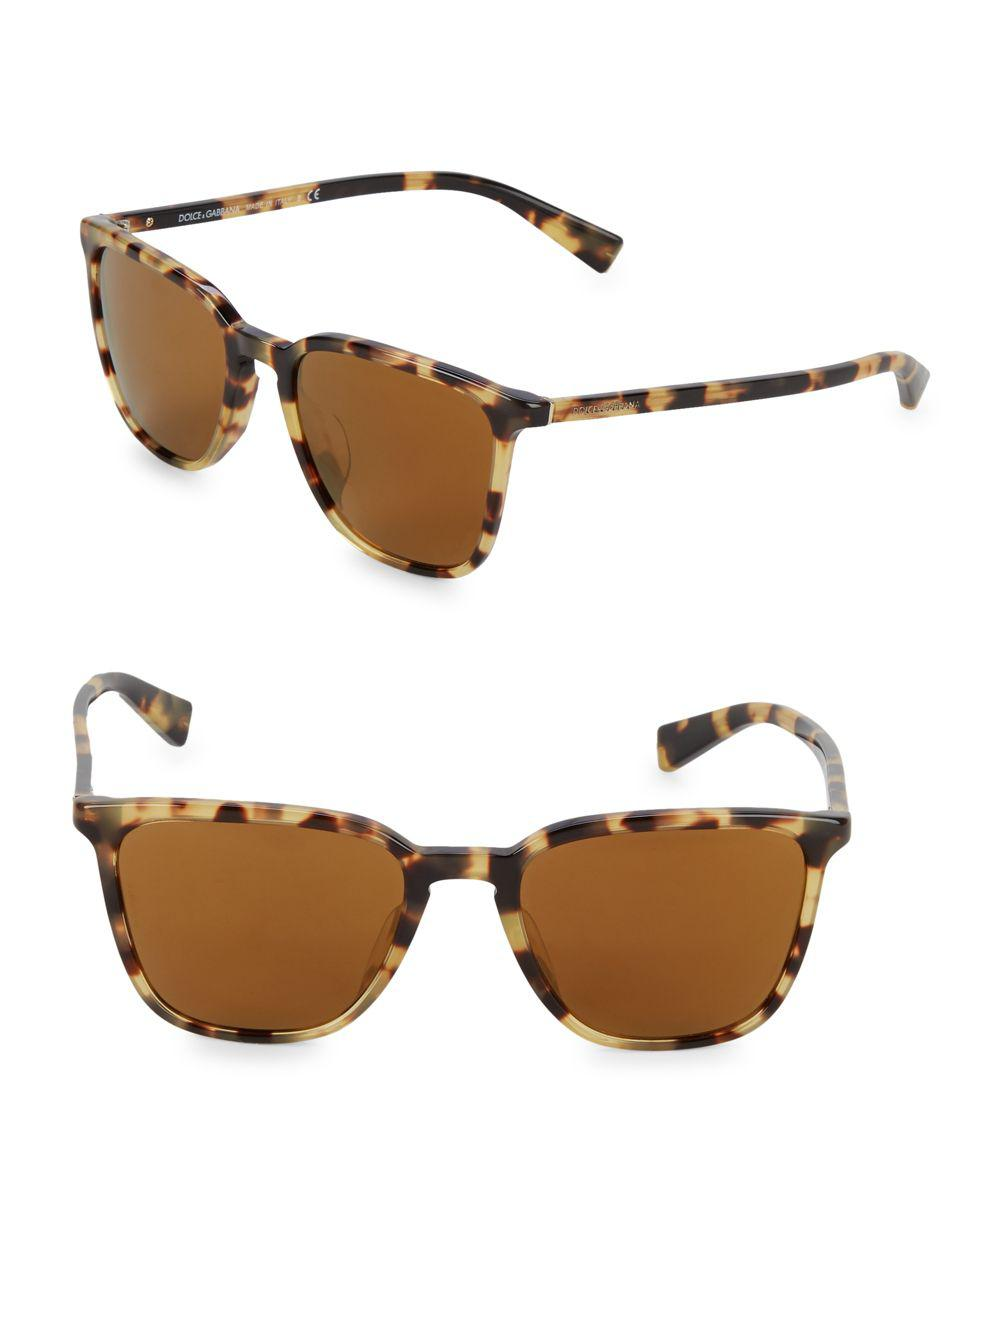 aeda63cc885 Dolce   Gabbana Dg4301f 53mm Cateye Sunglasses in Brown - Lyst